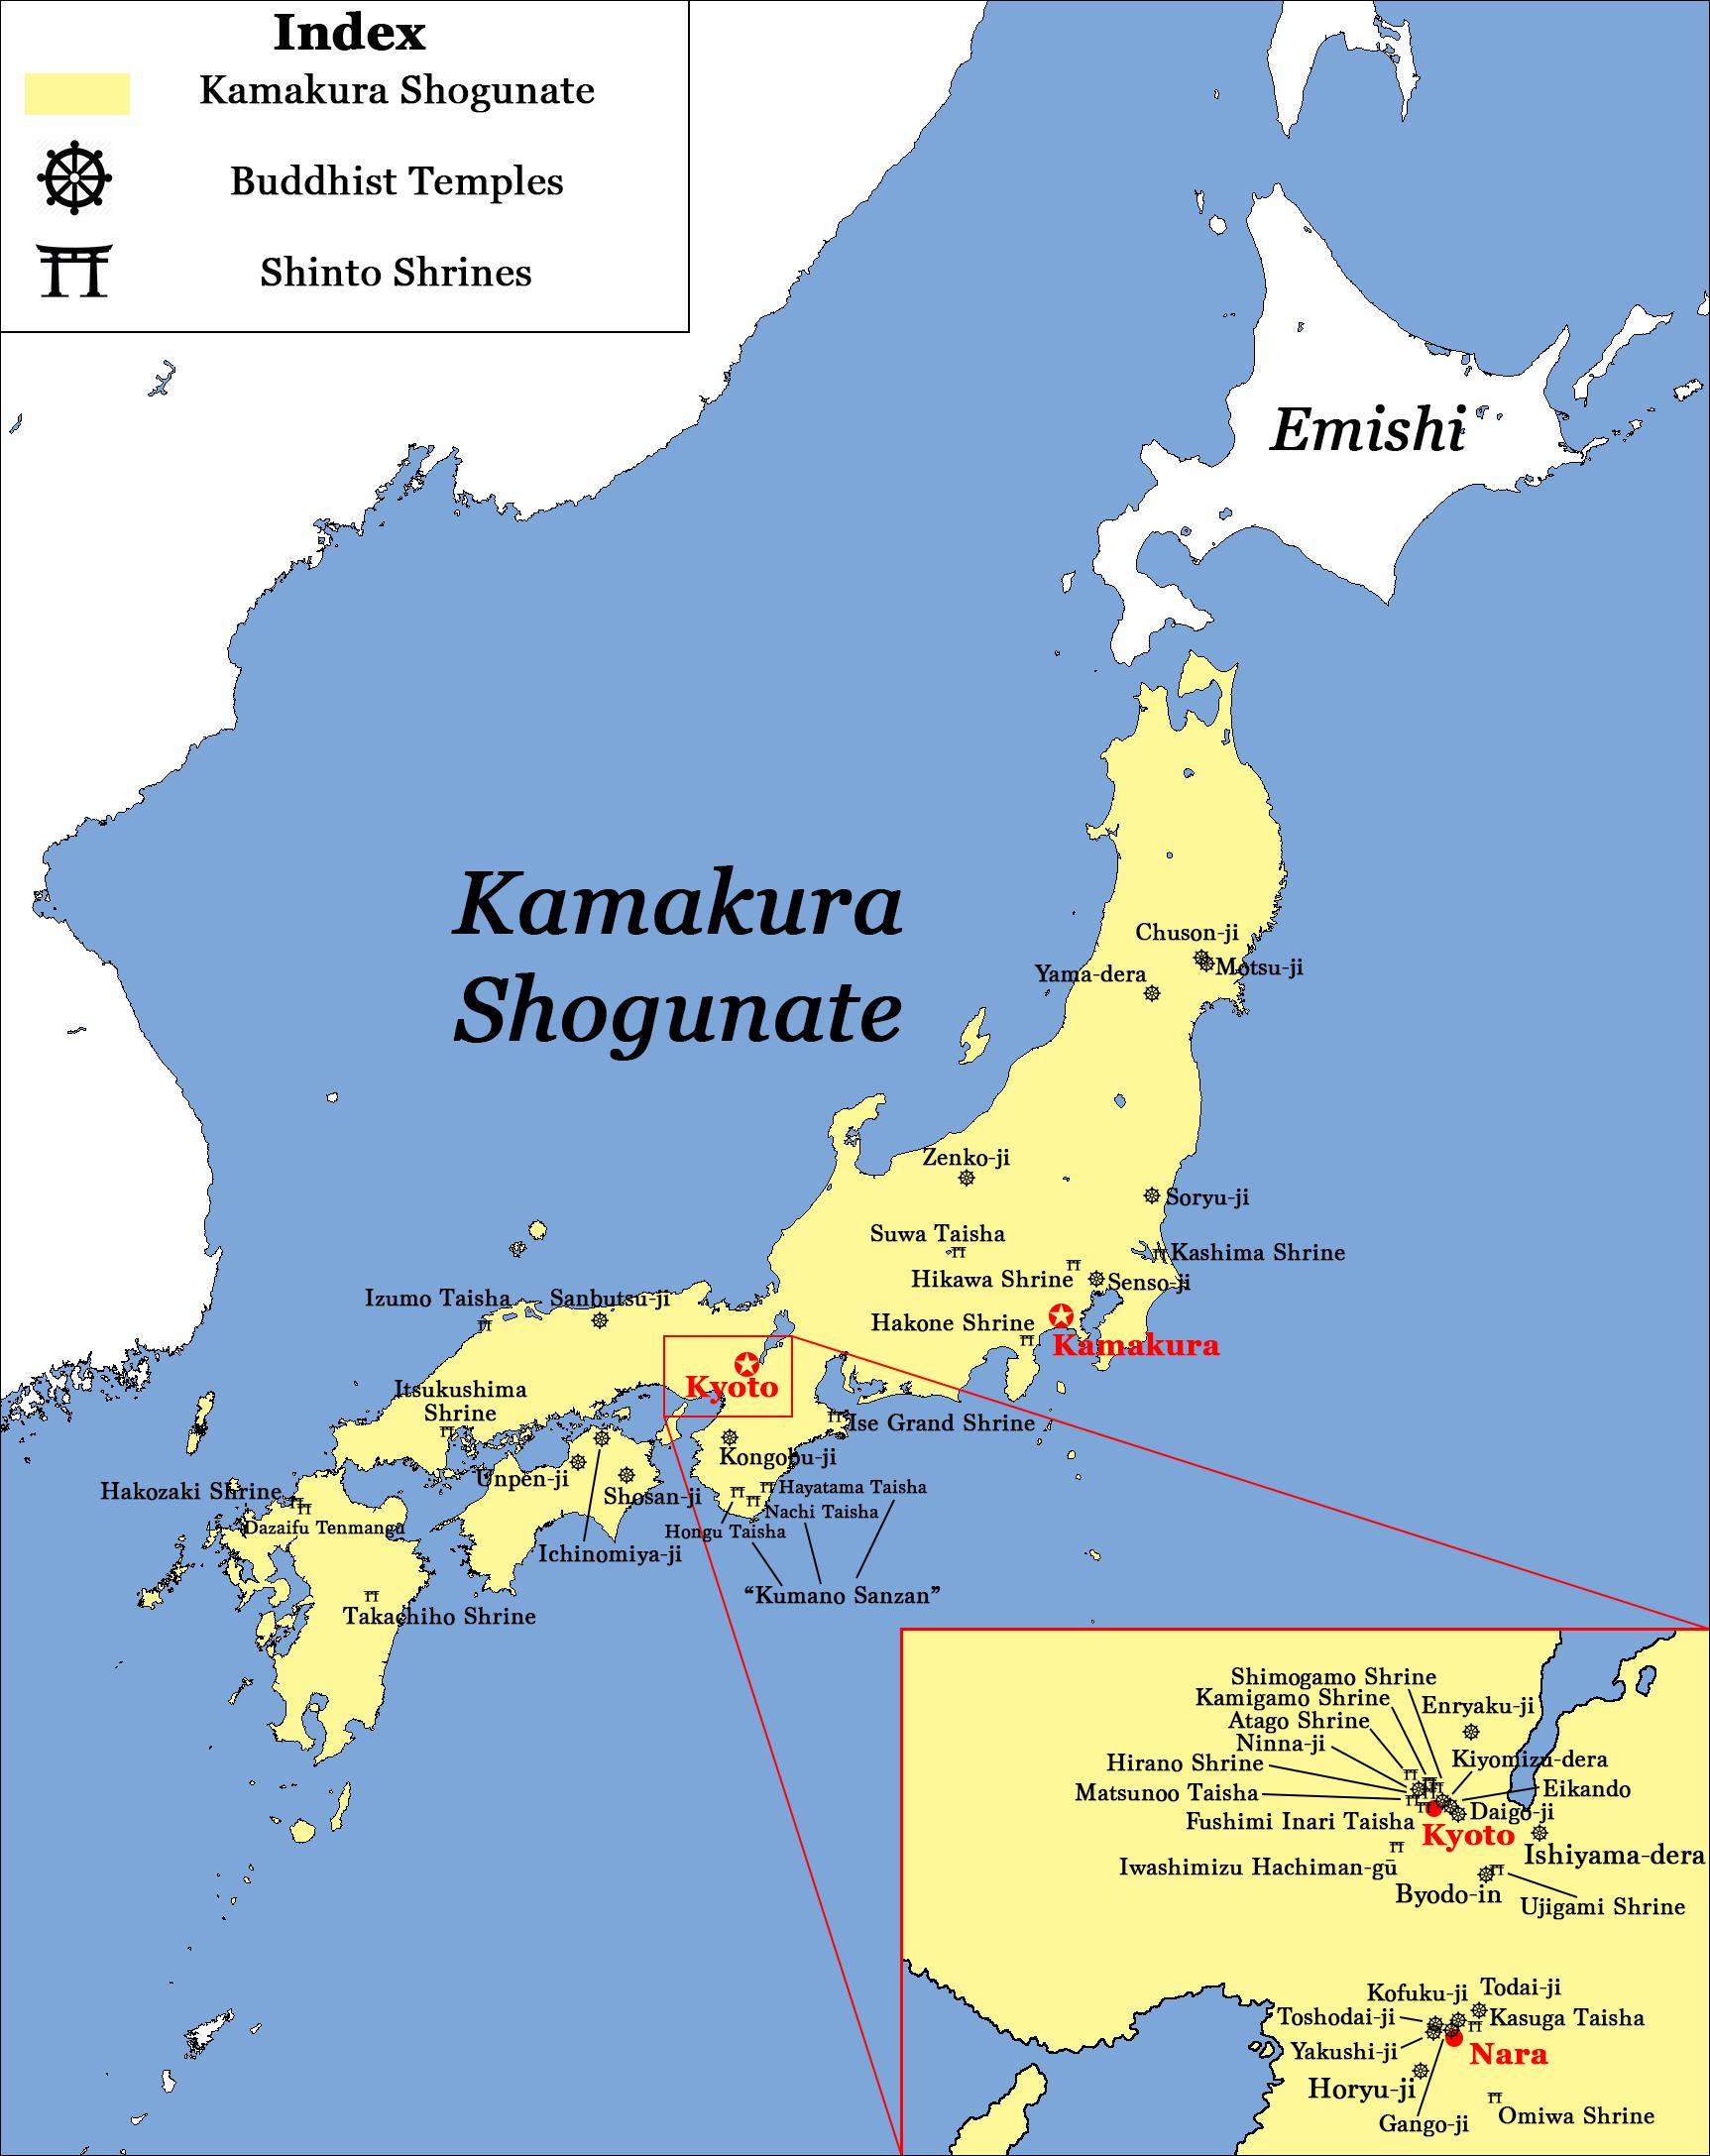 Major Temples and Shrines of Japan circa 1200 CE, Kamakura